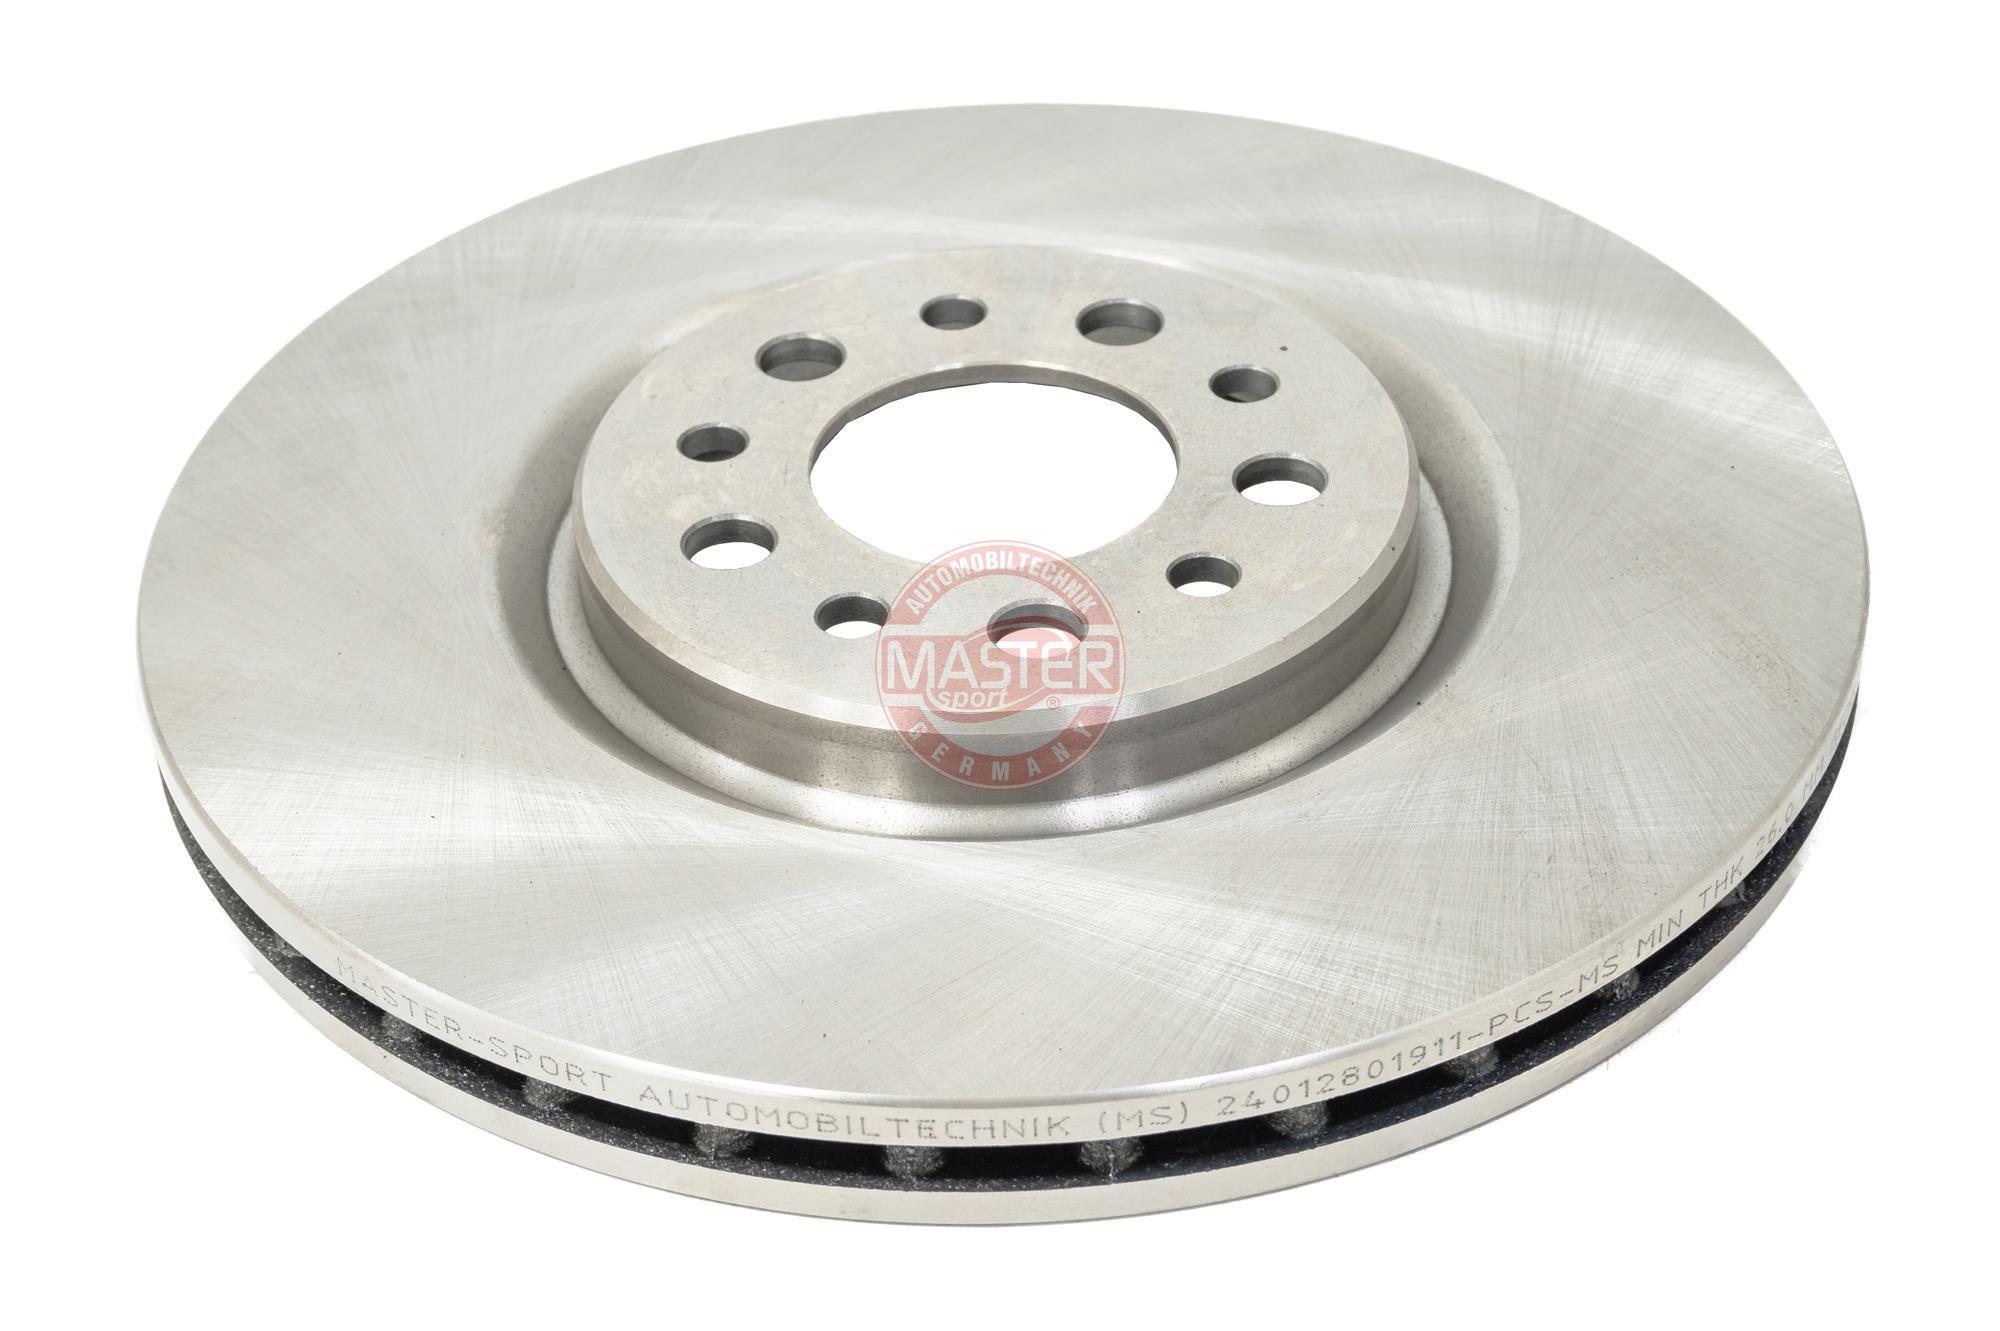 Bremsscheibe MASTER-SPORT 24012801911-PCS-MS Bewertungen